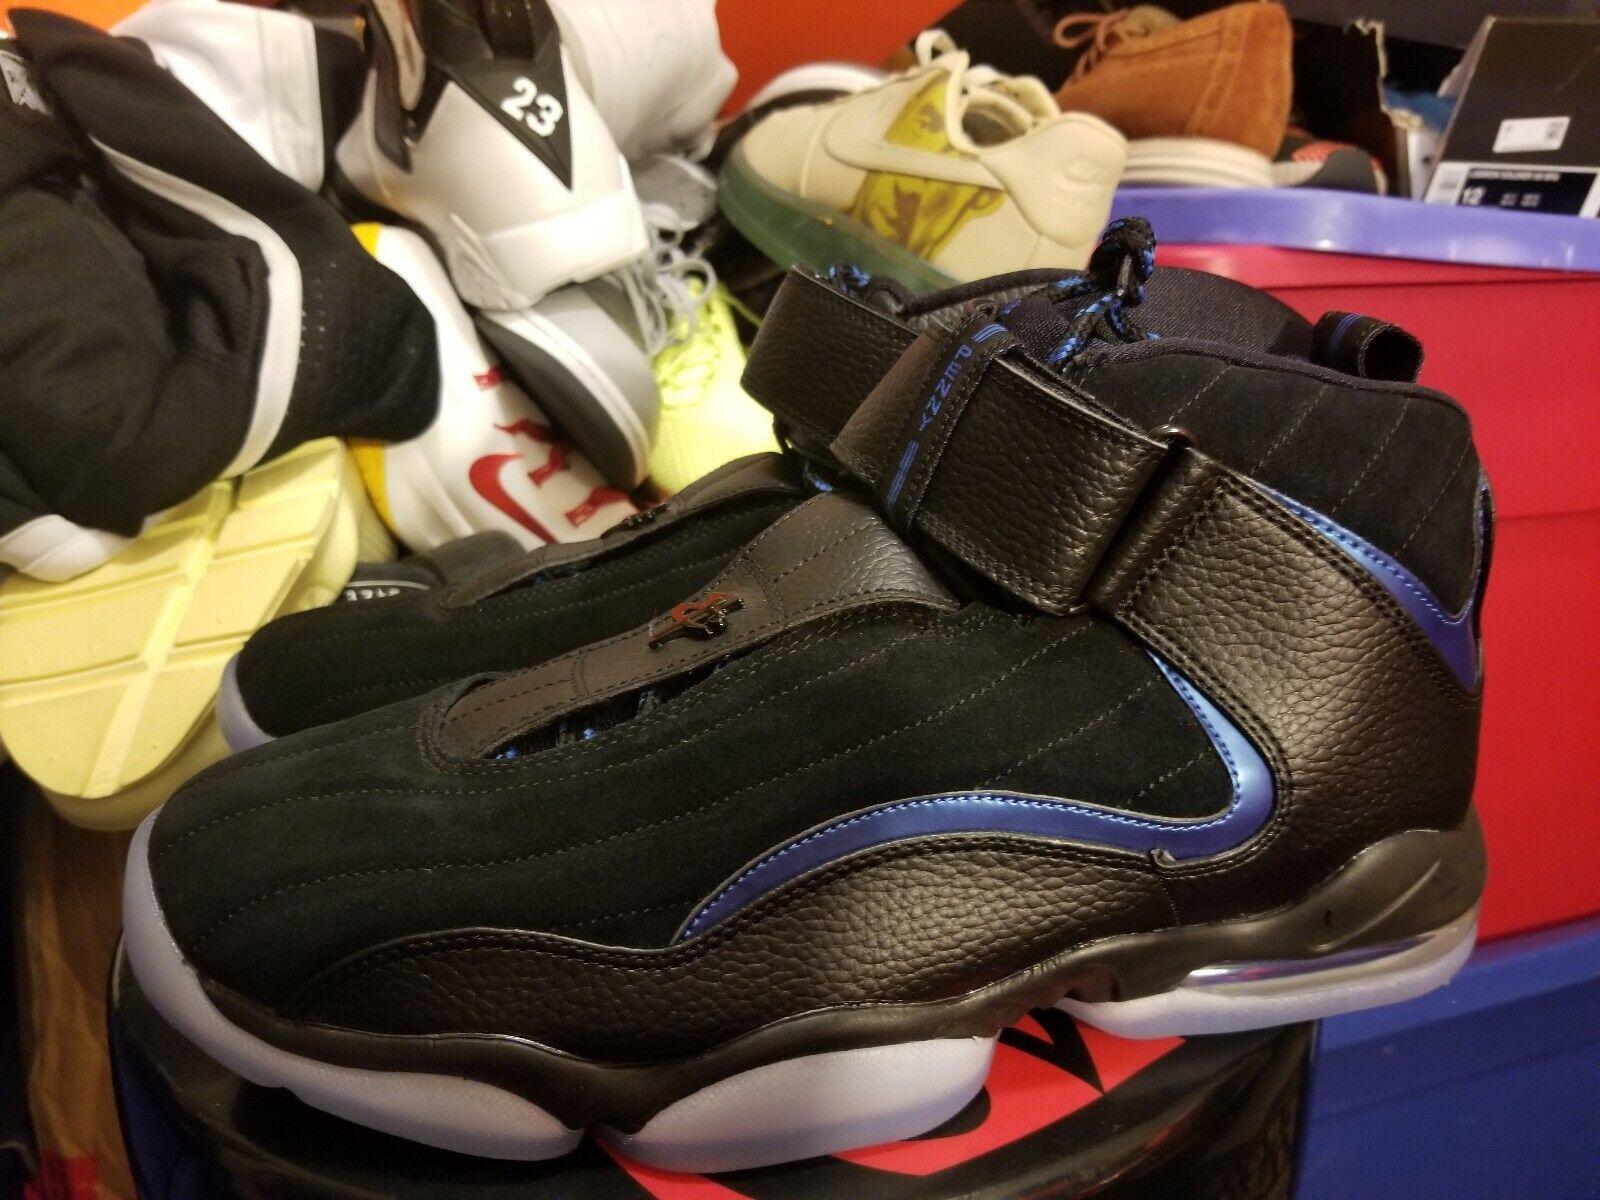 4b5af9b4531f9d Nike Air Penny IV 4 Sz. 11.5 penny Hardaway Hardaway Hardaway Black bluee  orlando Magic